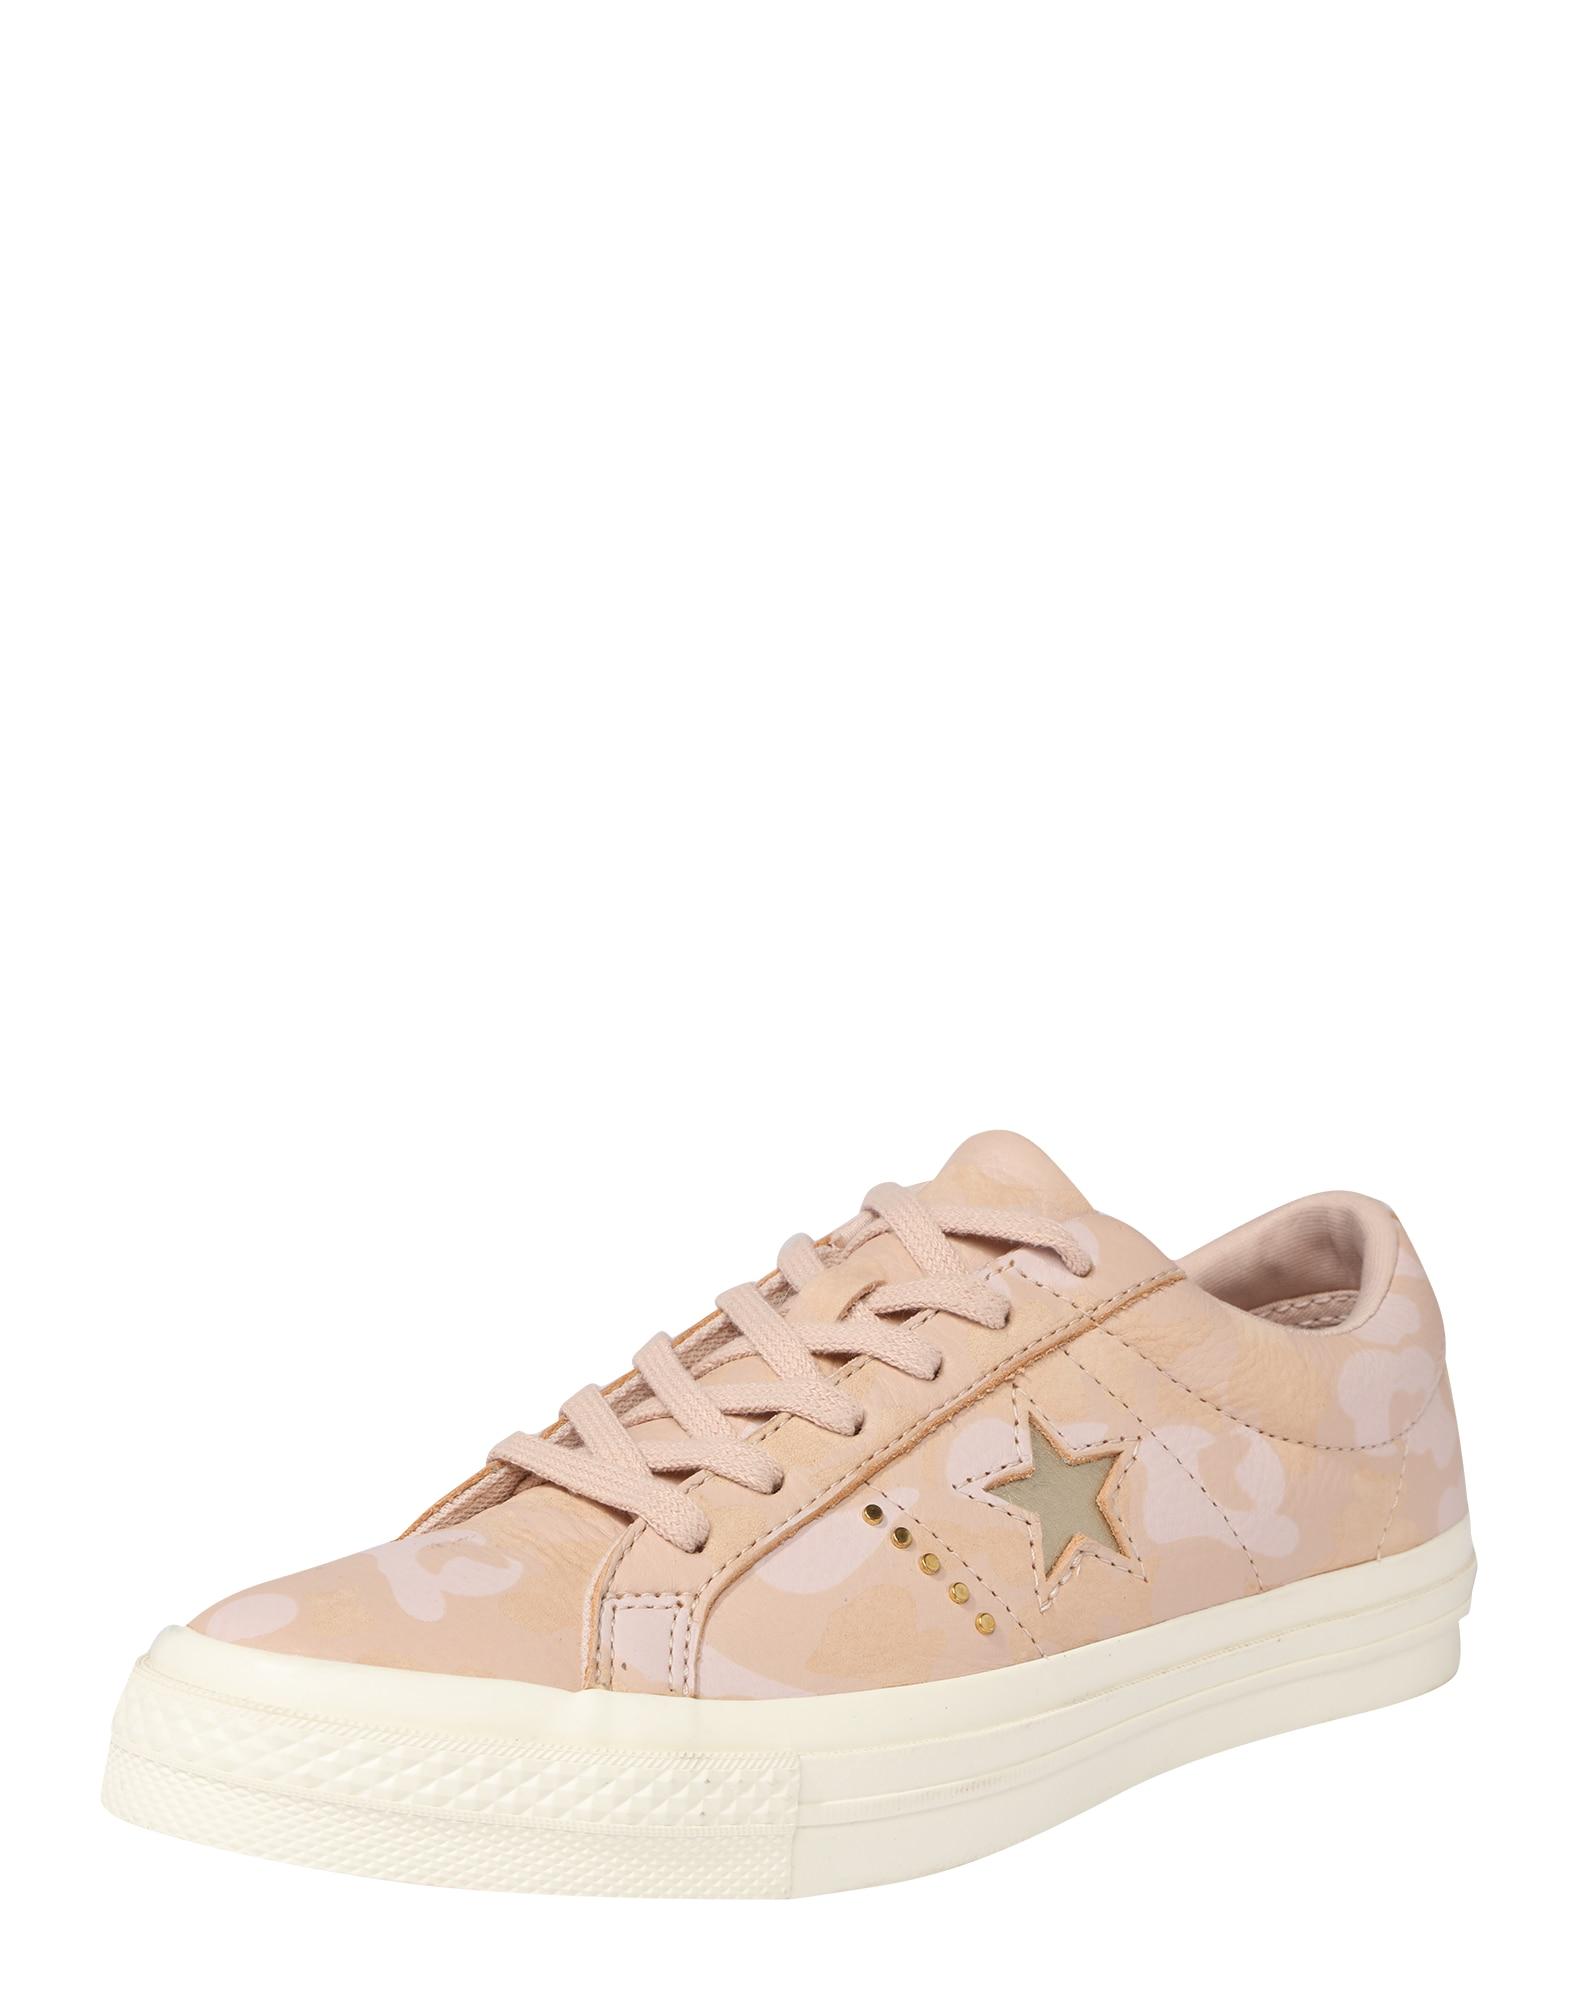 CONVERSE, Dames Sneakers laag 'One Star Ox', beige / goud / rosa